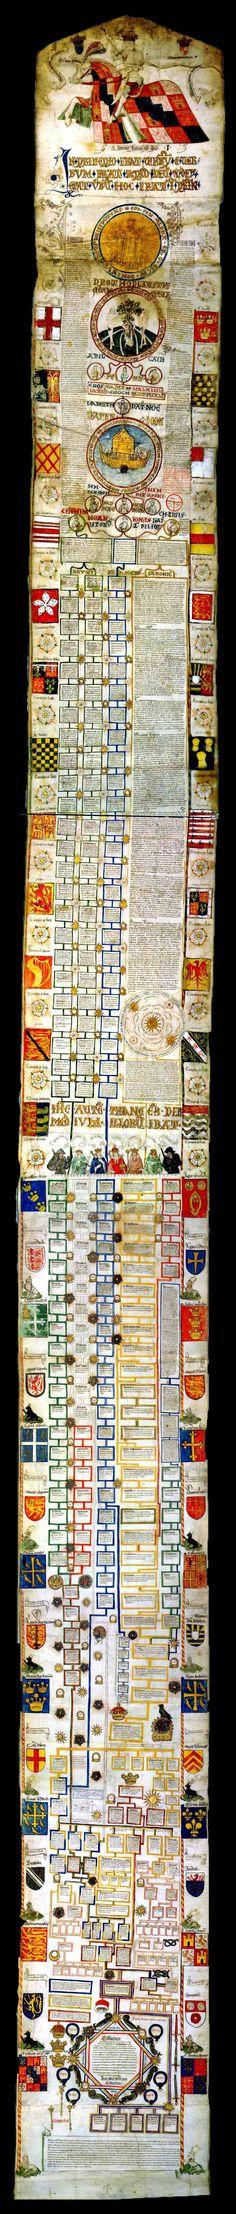 The Edward IV Roll (Free Library of Philadelphia, Lewis MS E201)